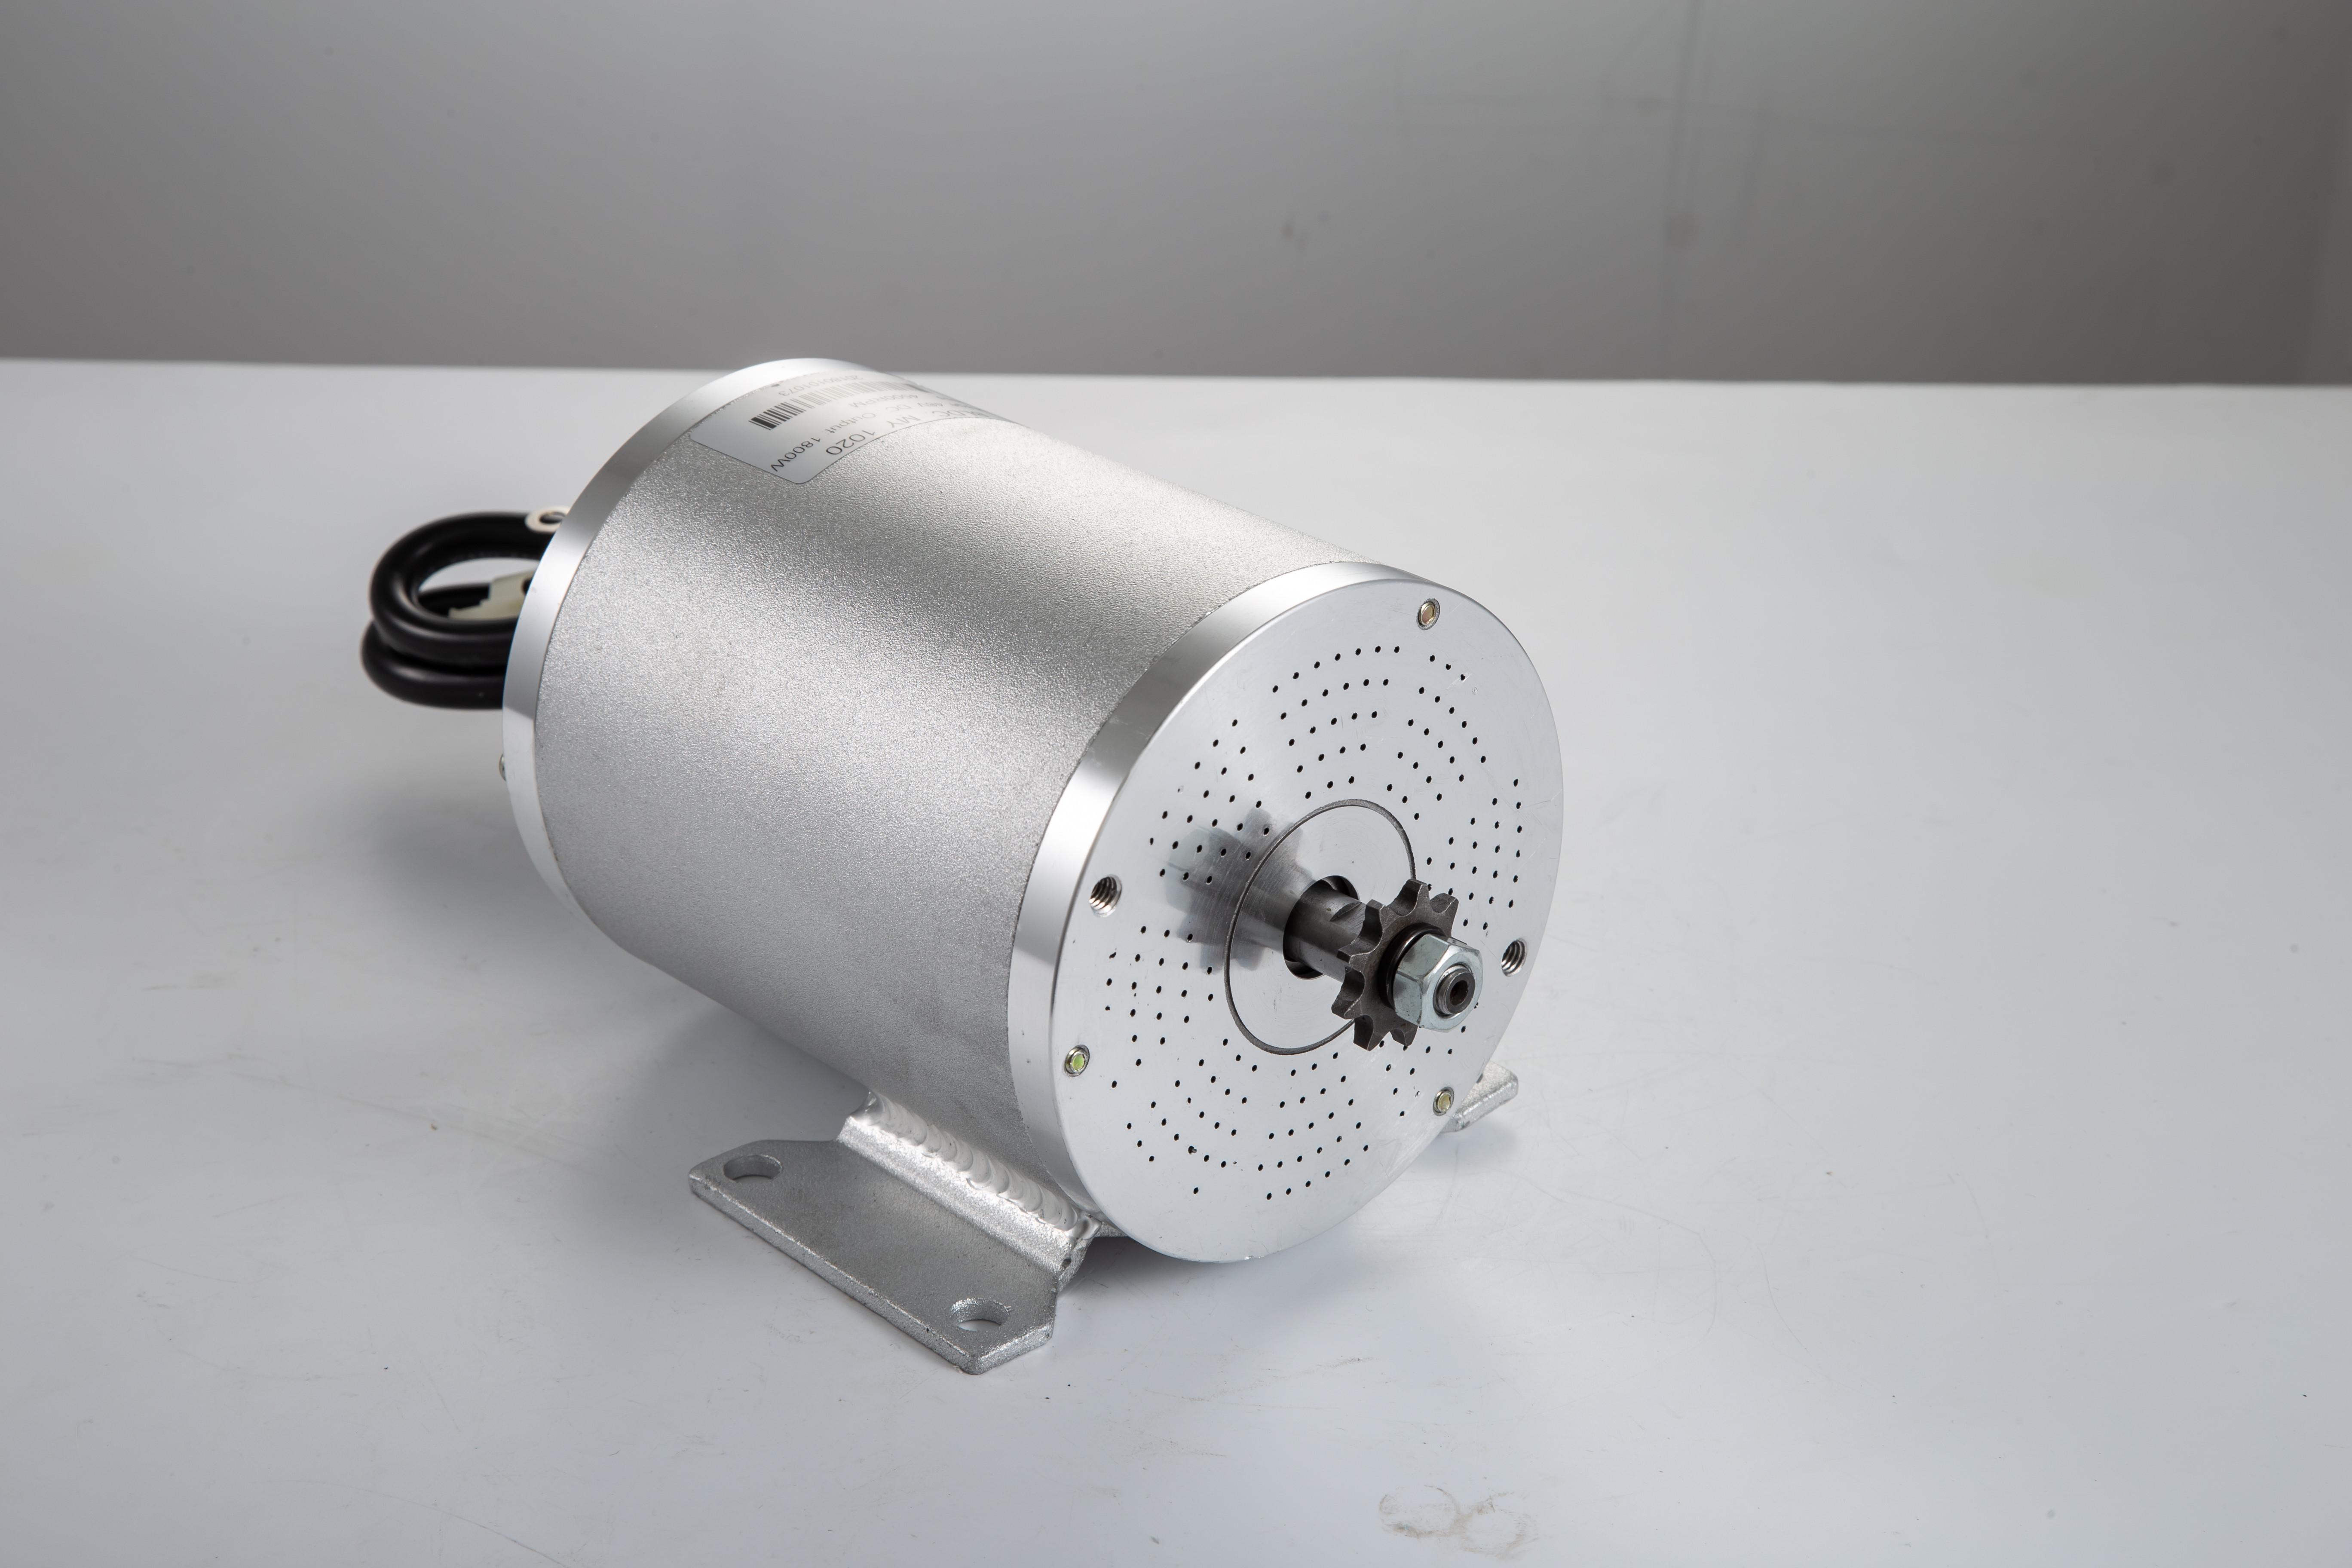 1800W-48V-DC-Brushless-Electric-Motor-Kit-f-Scooter-500-1800W-E-Bike-Go-Kart thumbnail 182